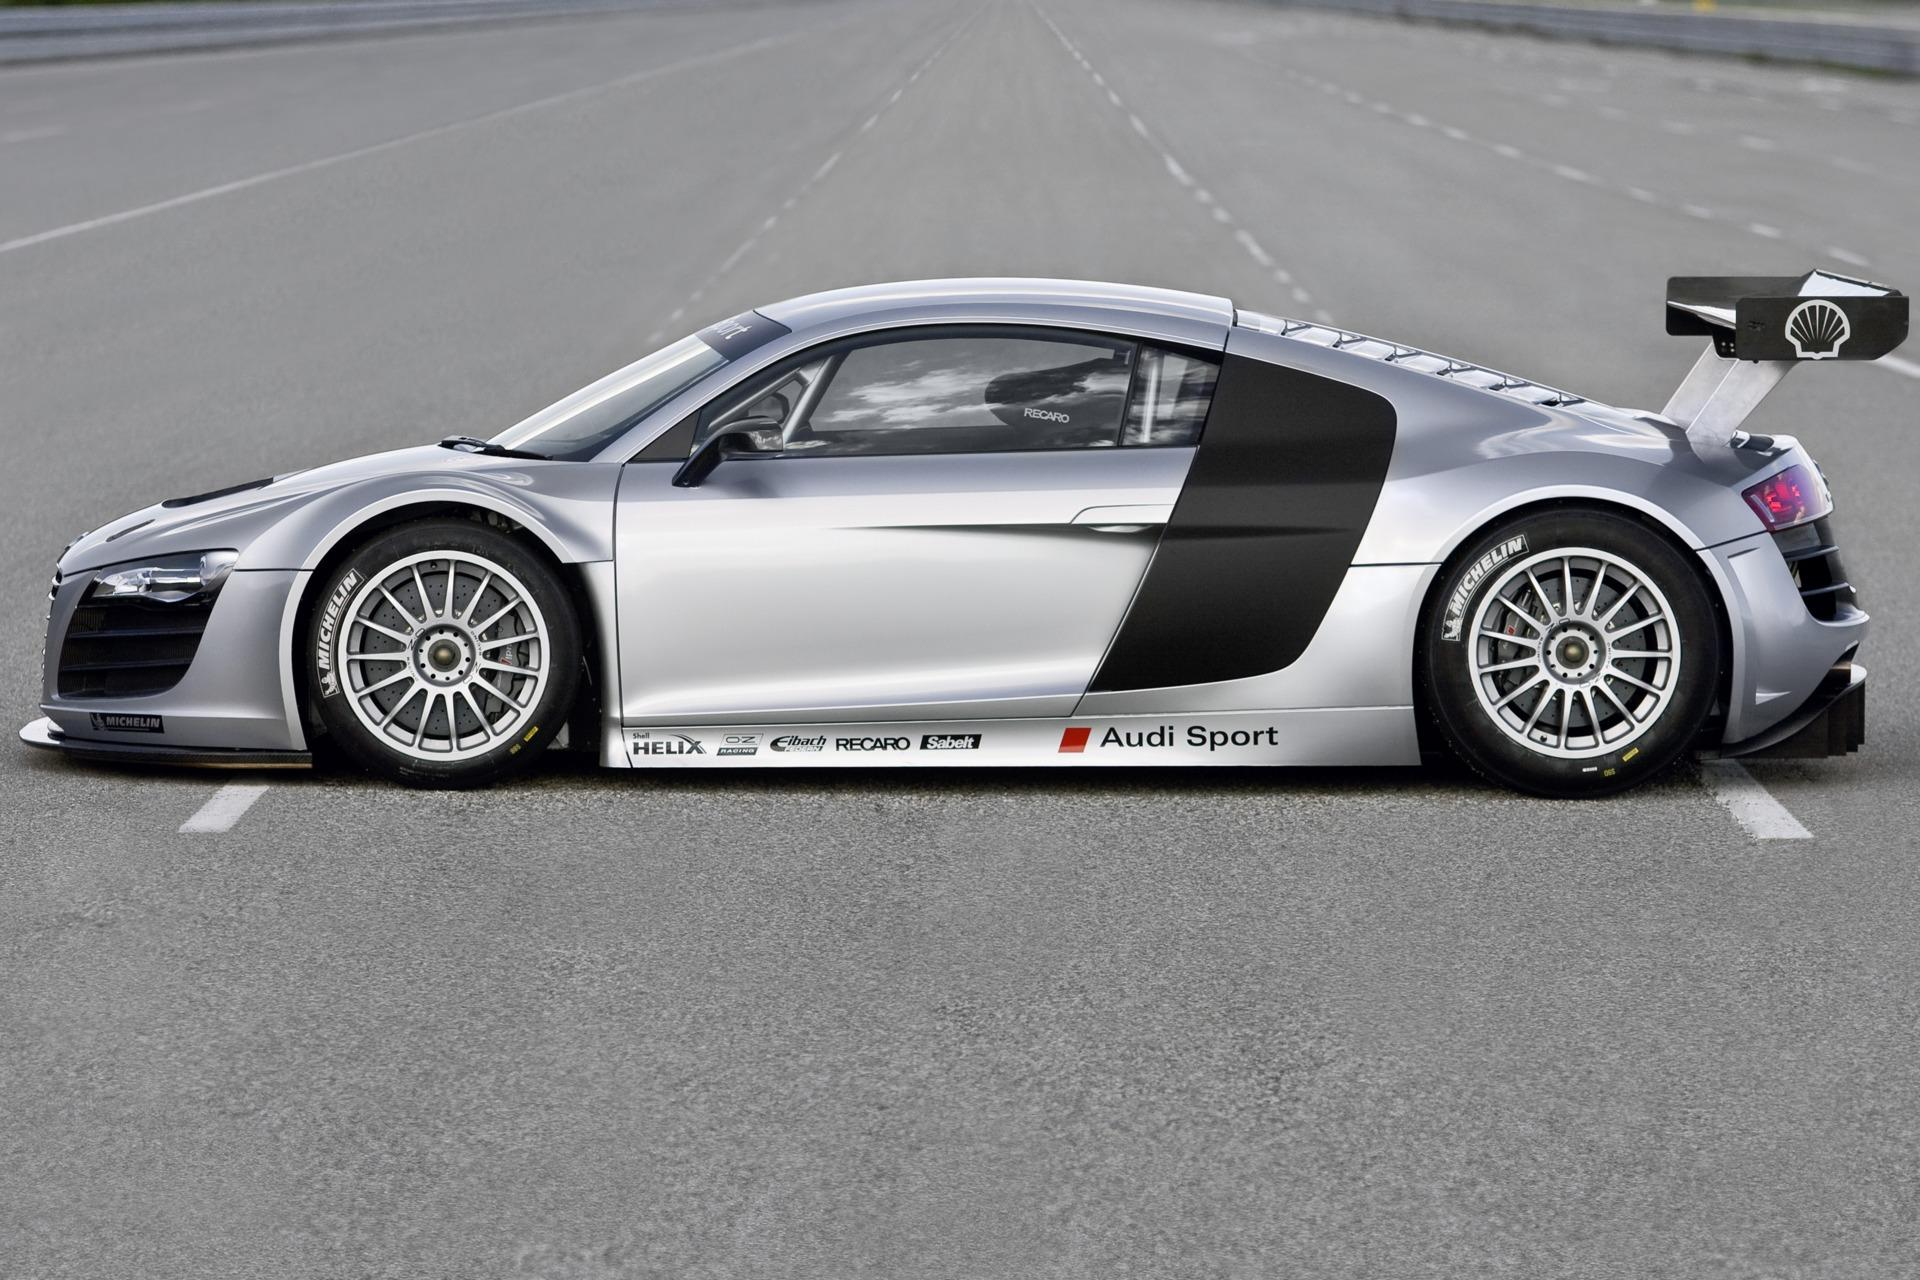 2008 Audi R8 Gt3 News And Information Conceptcarz Com